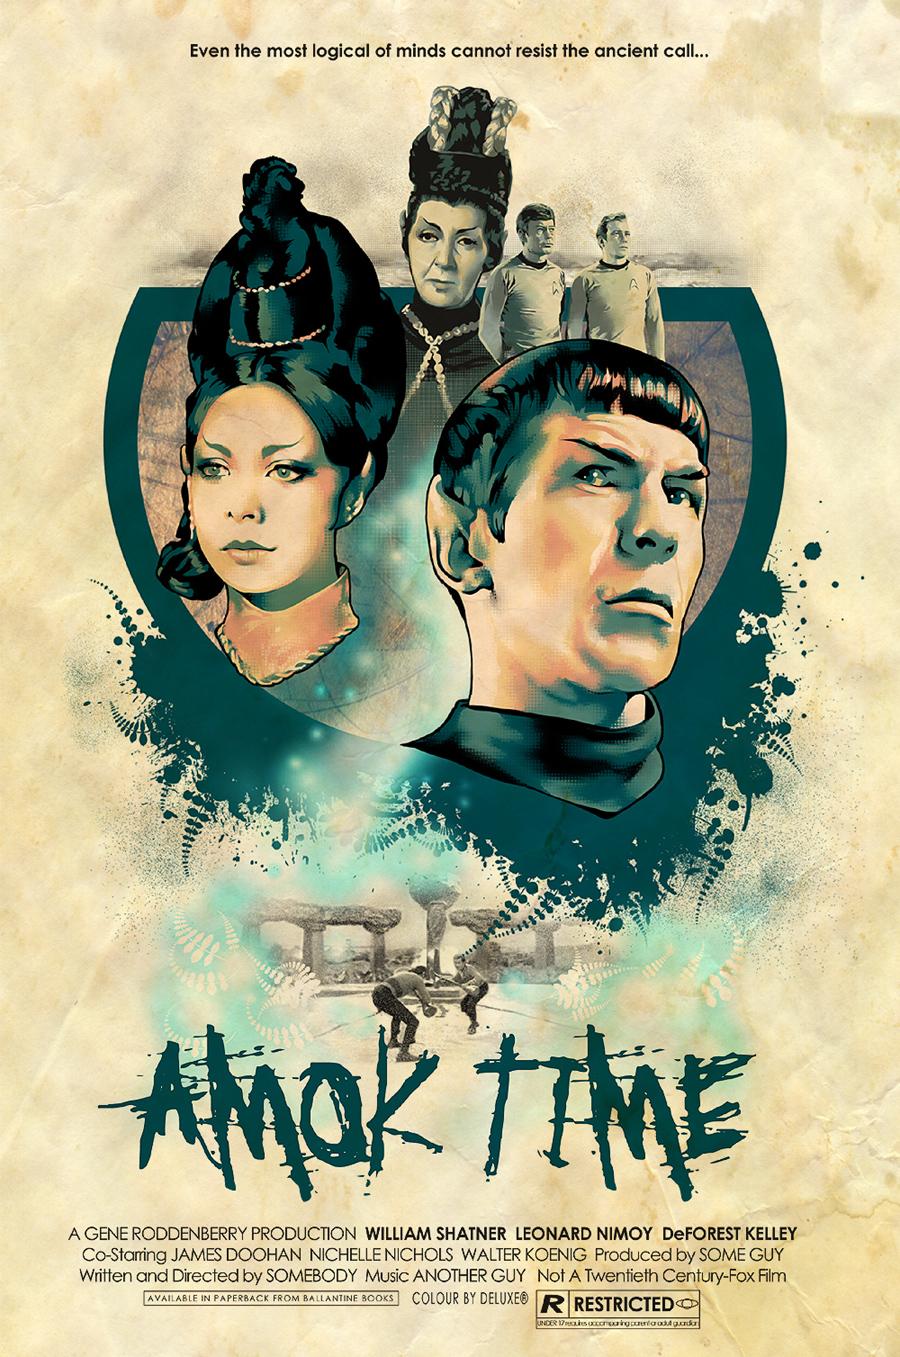 TOSART: Amok Time